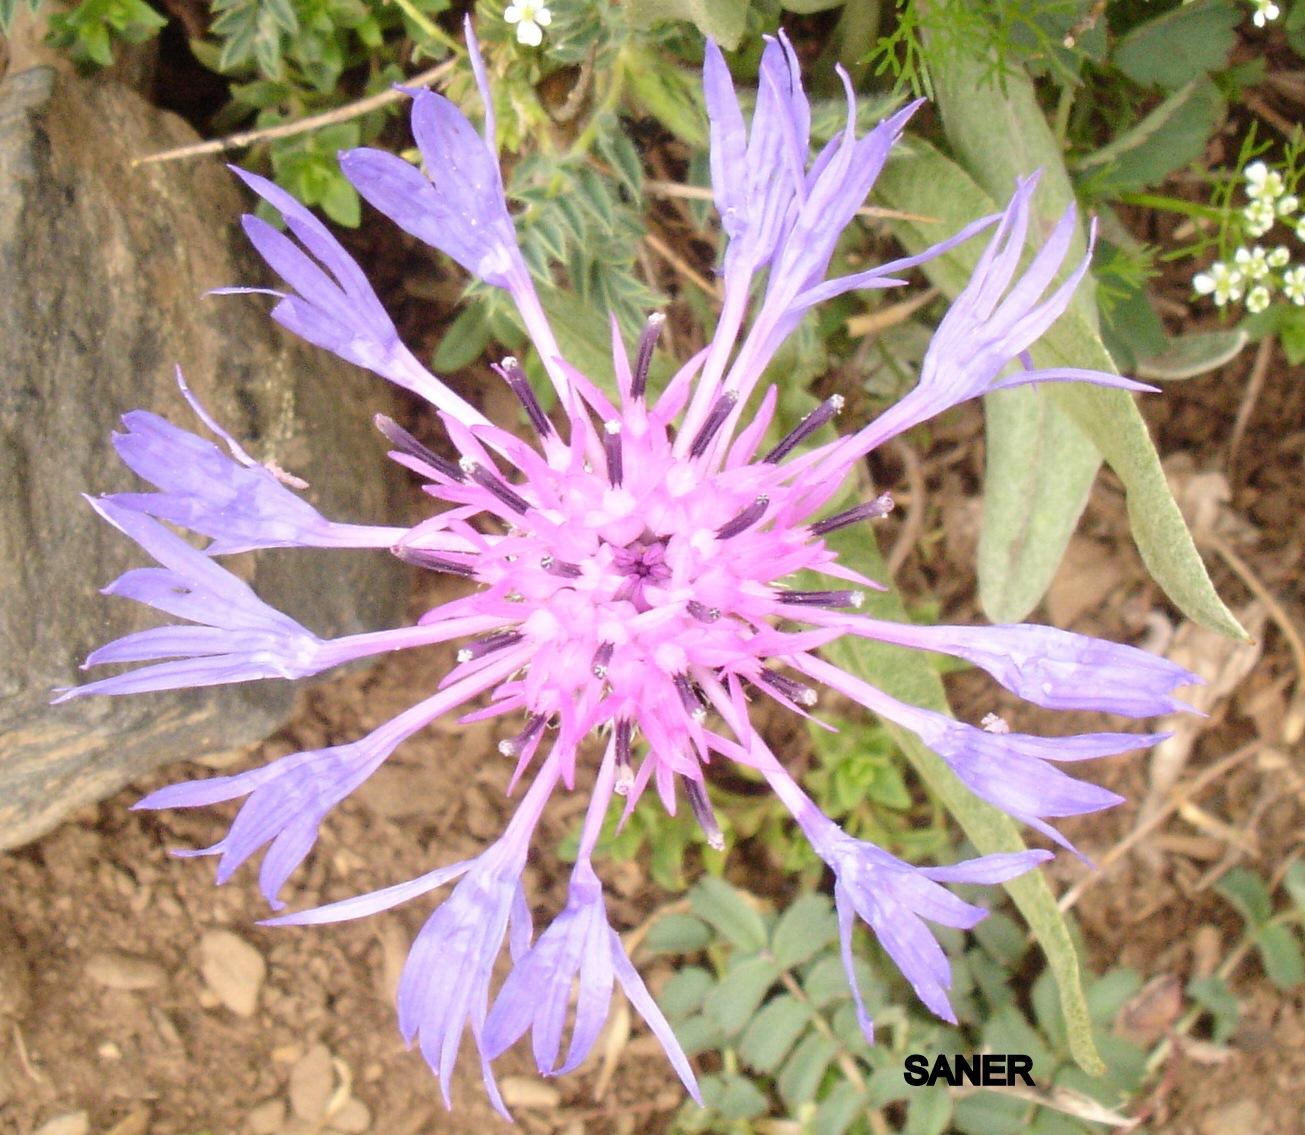 NATURE by Saygın Saner